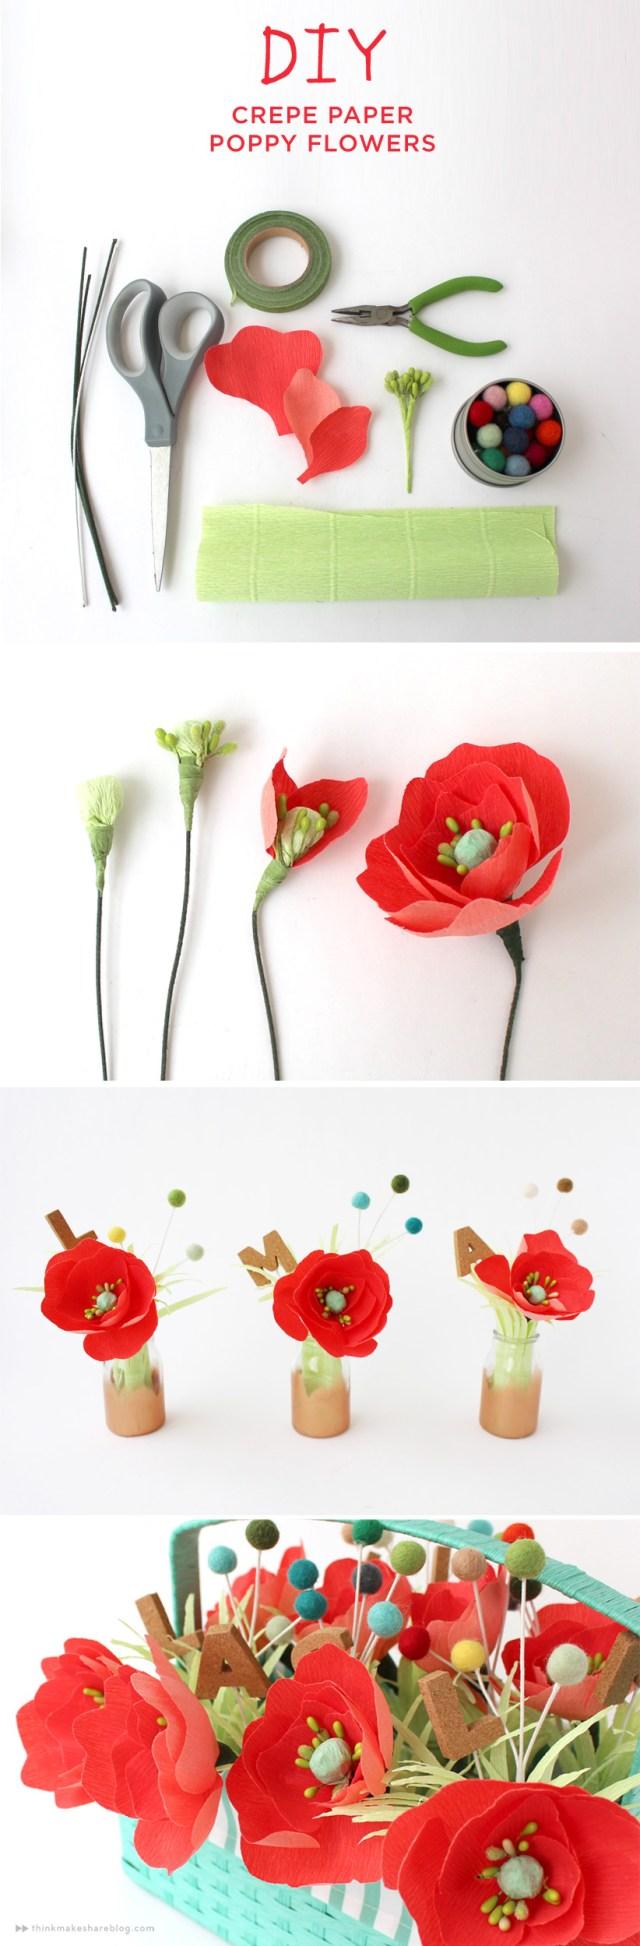 DIY-CREPE-PAPER-POPPY-FLOWER-FROM-HALLMARK